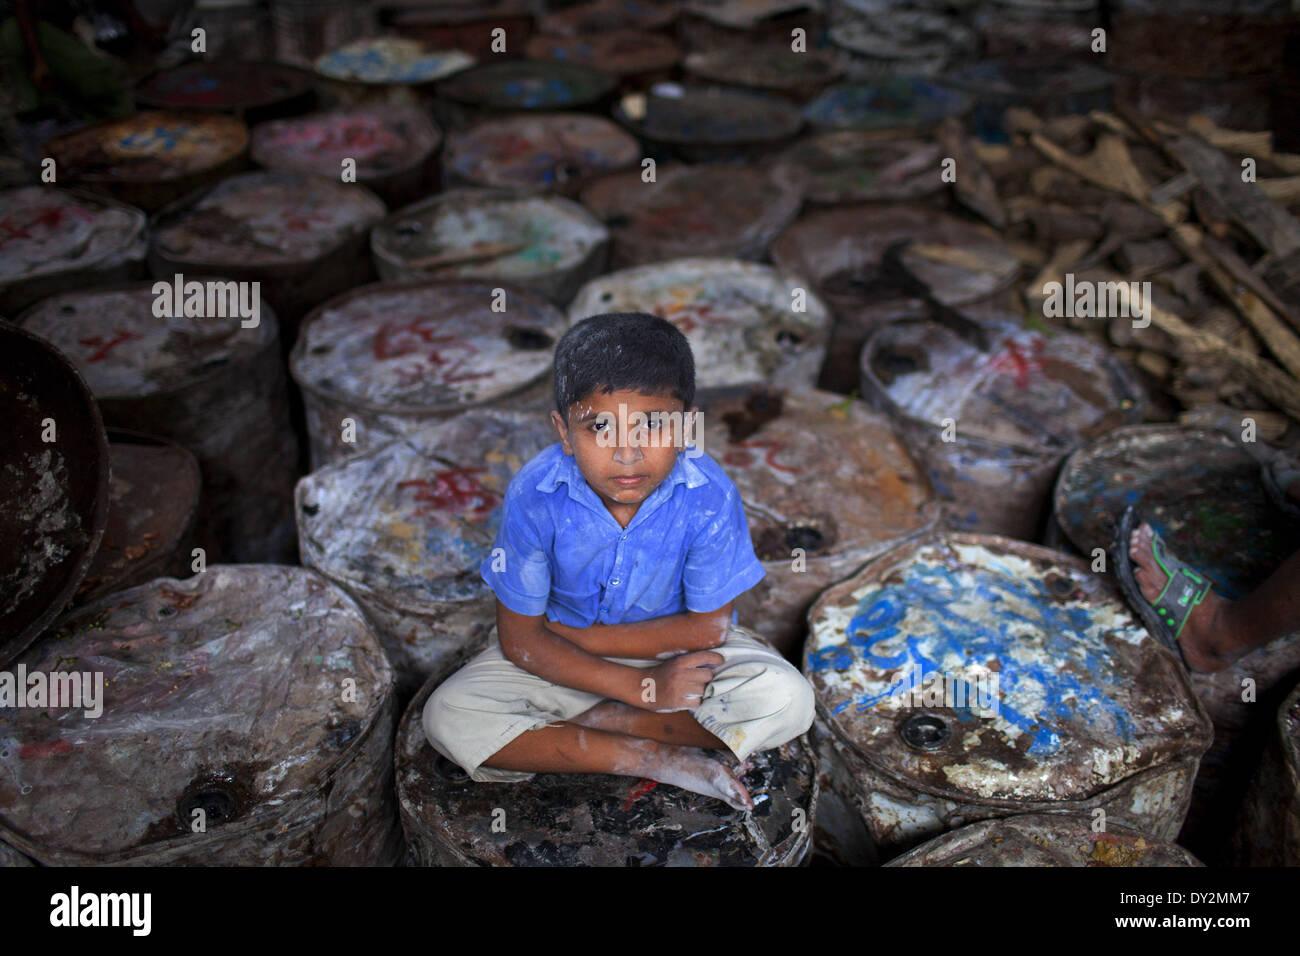 Dhaka, Bangladesh. 4th Apr, 2014. ISLAM is 8 years old, works at a manual soap factory in Dhaka, Bangladesh. Child - Stock Image